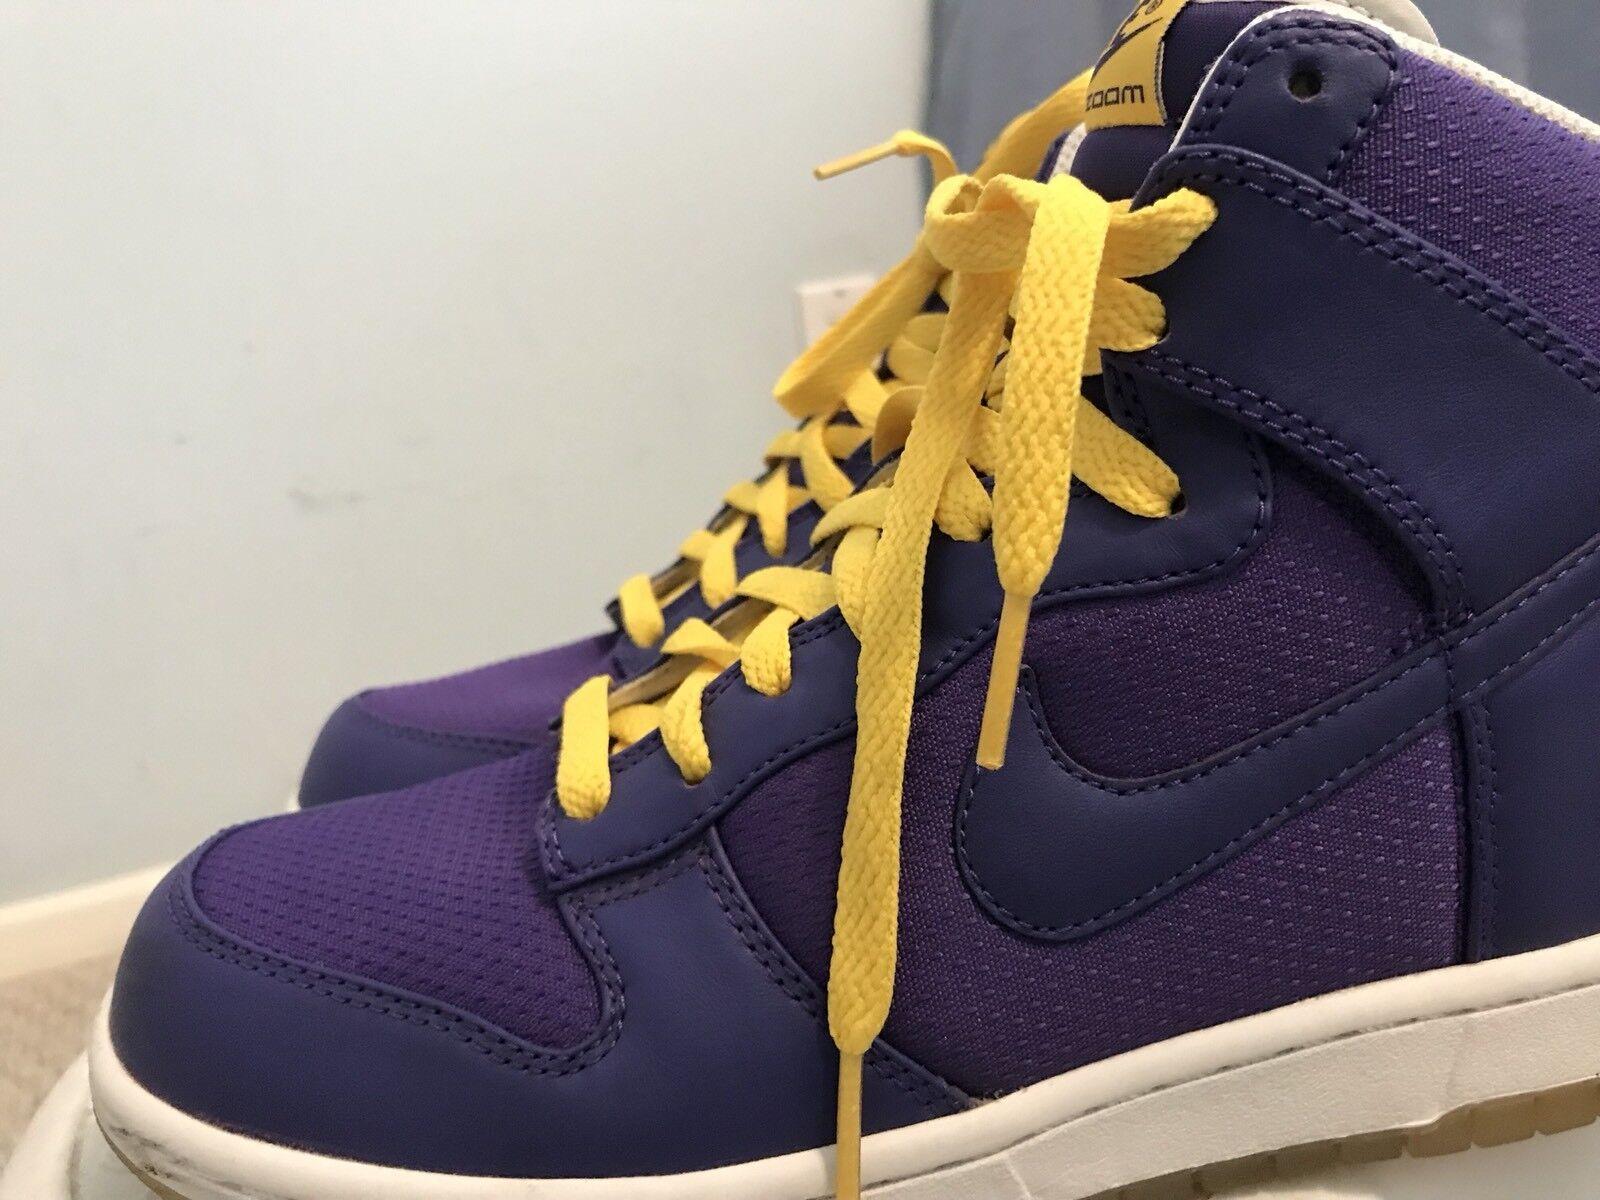 Nike lakers dunk hohe lakers Nike sz 8 nds 182e91